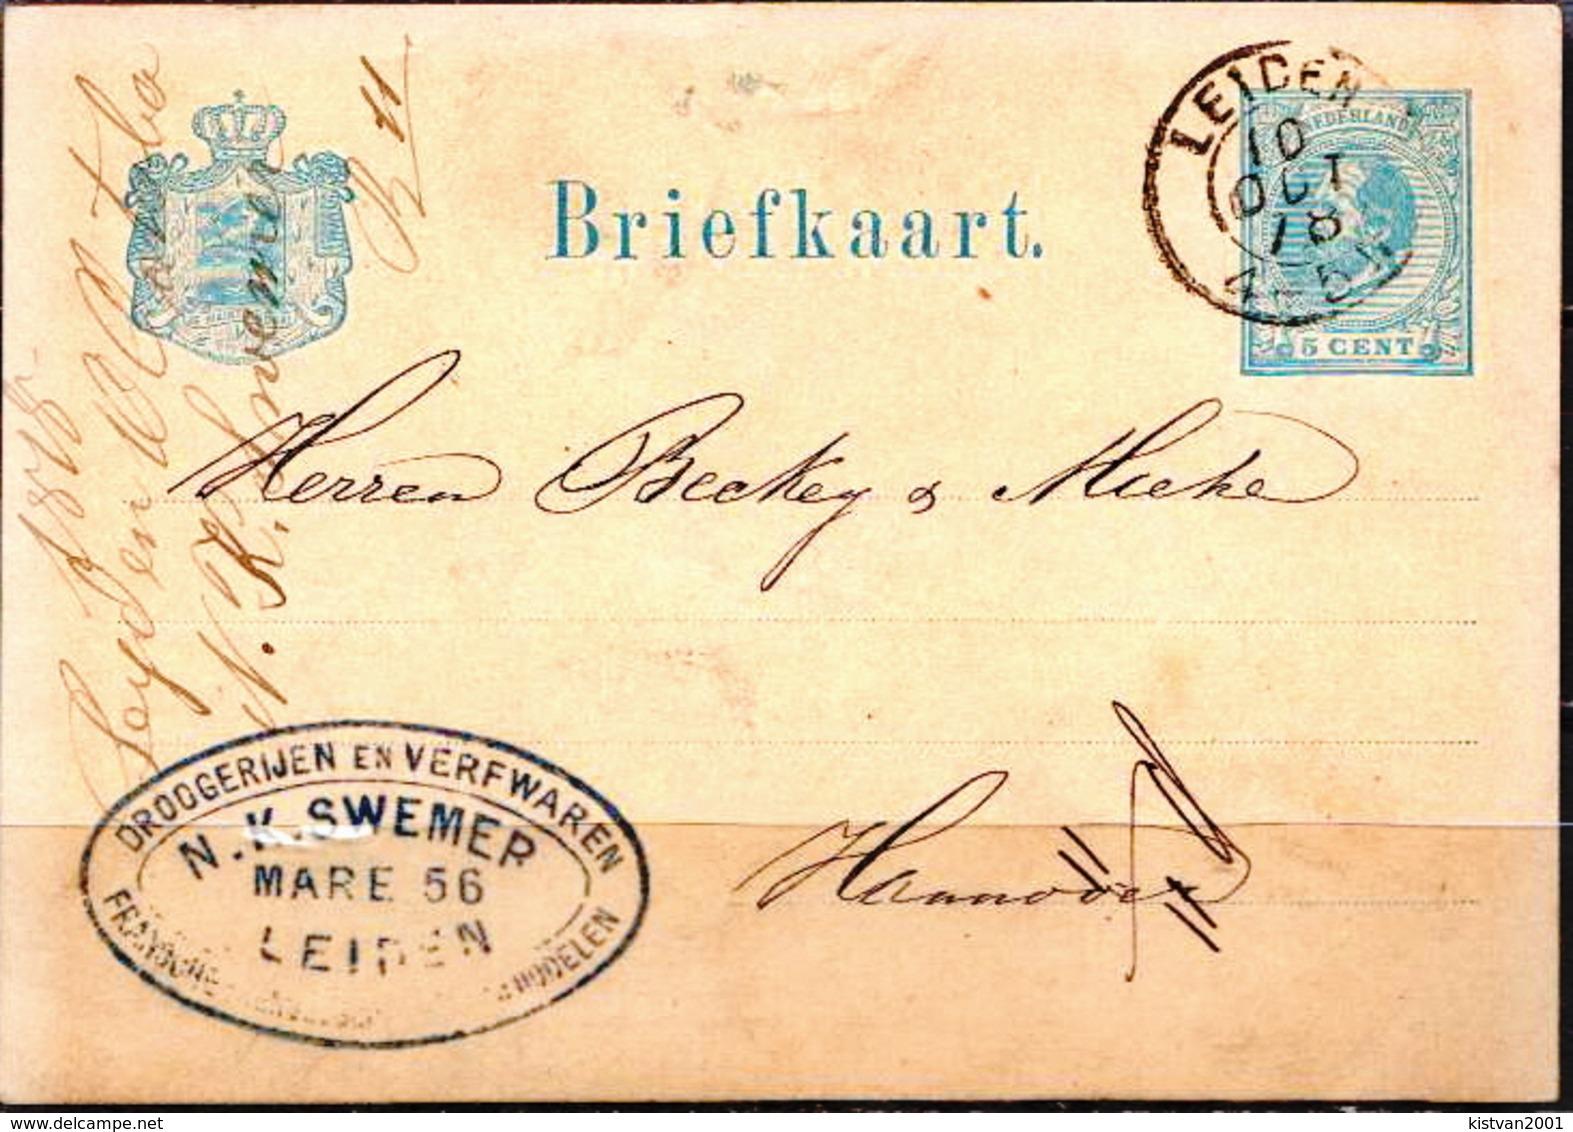 Postal History: Netherlands Postal Stationary From 1878 - Postal Stationery